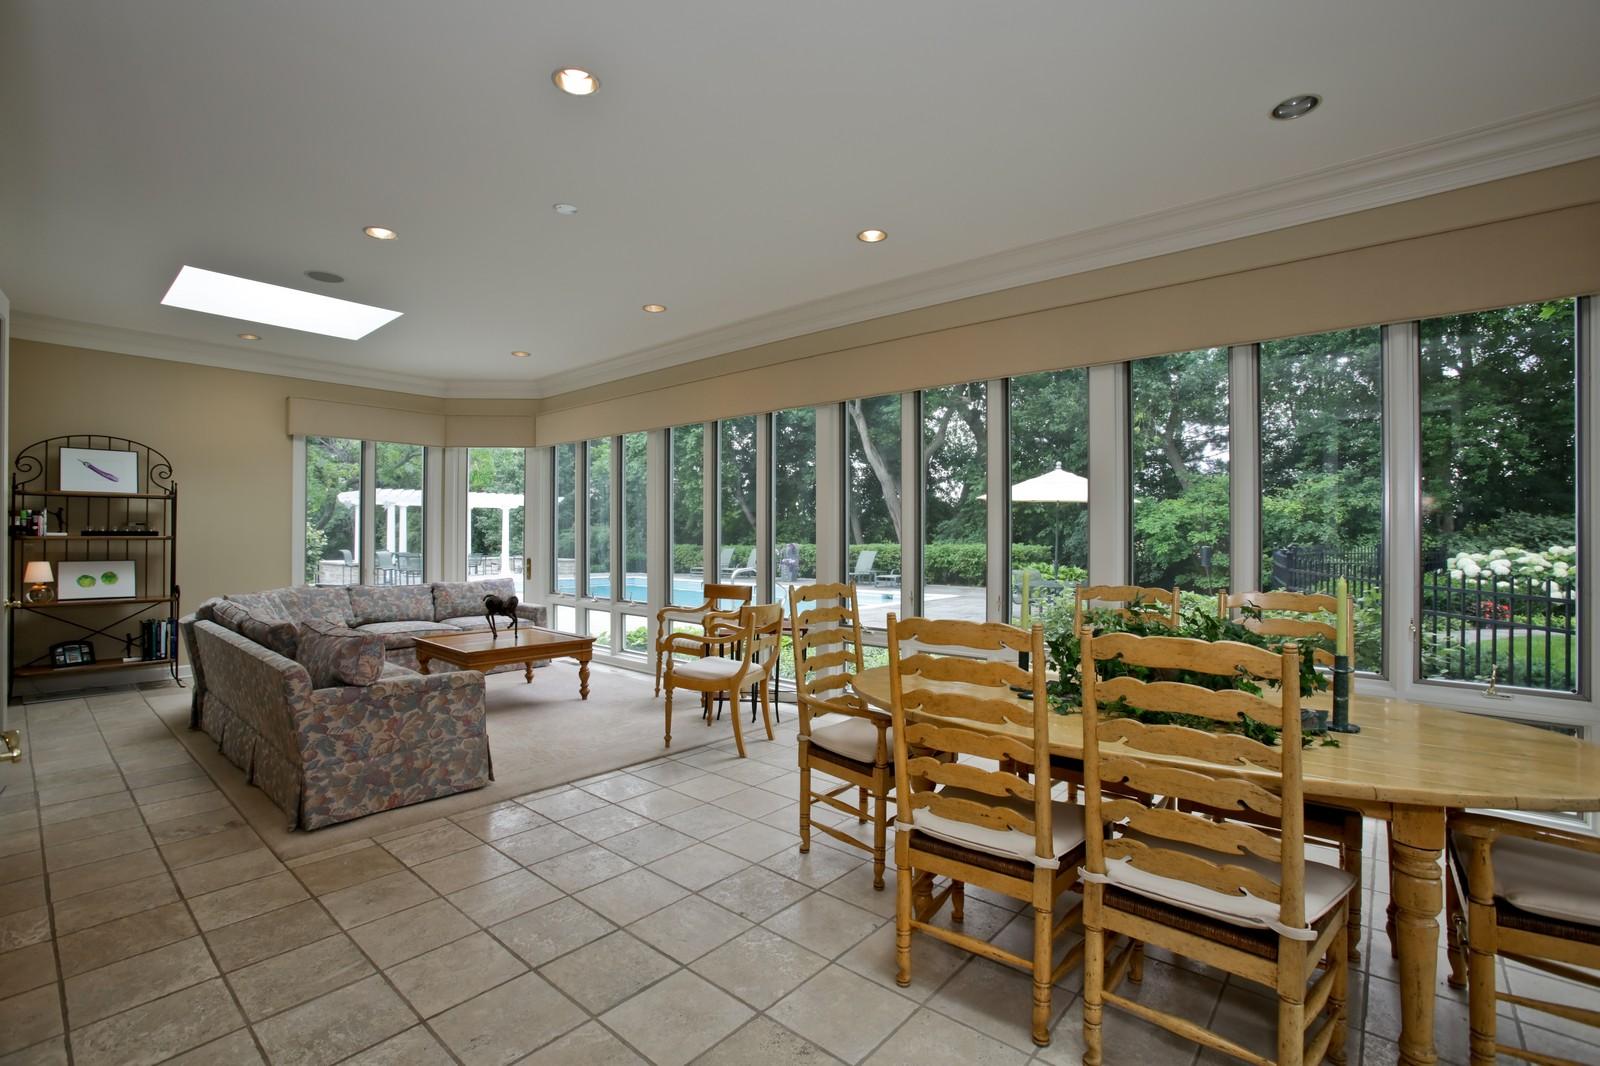 Real Estate Photography - 25W445 Plamondon Rd, Wheaton, IL, 60189 - Sun Room